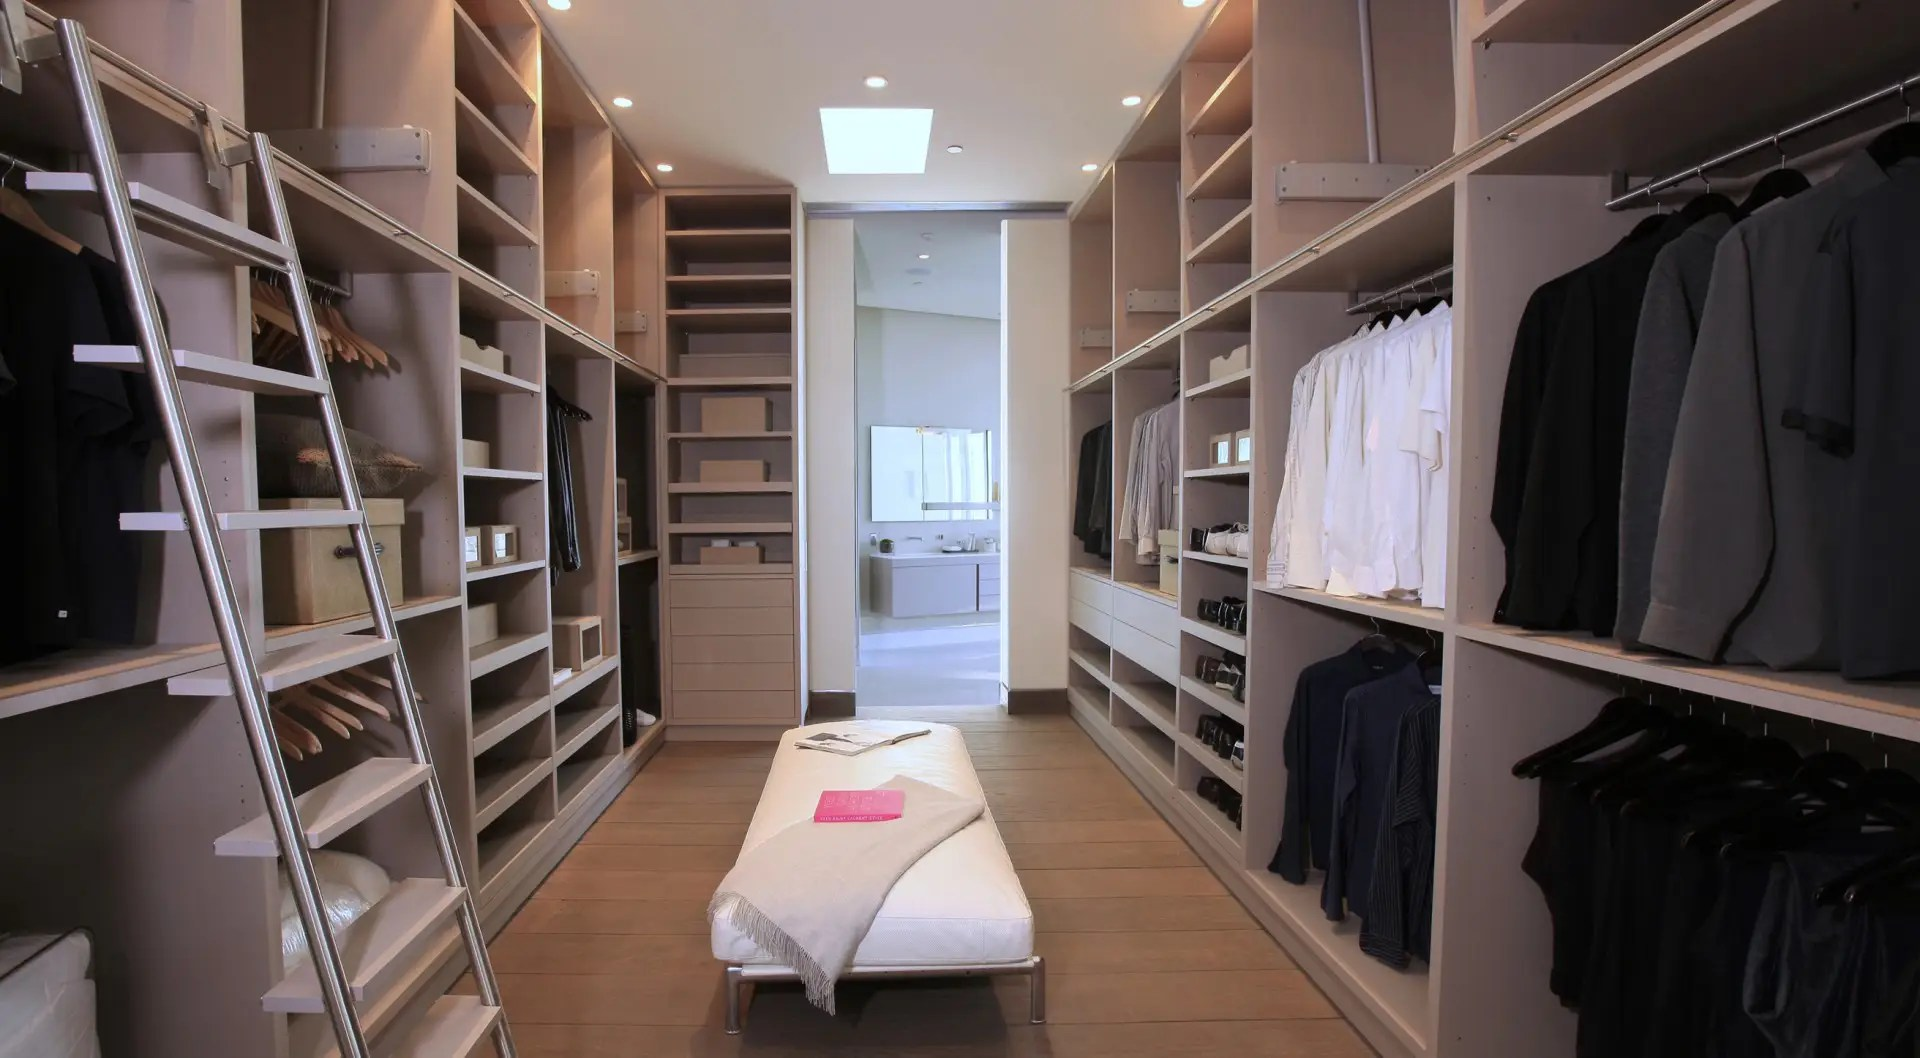 The closet is huge.